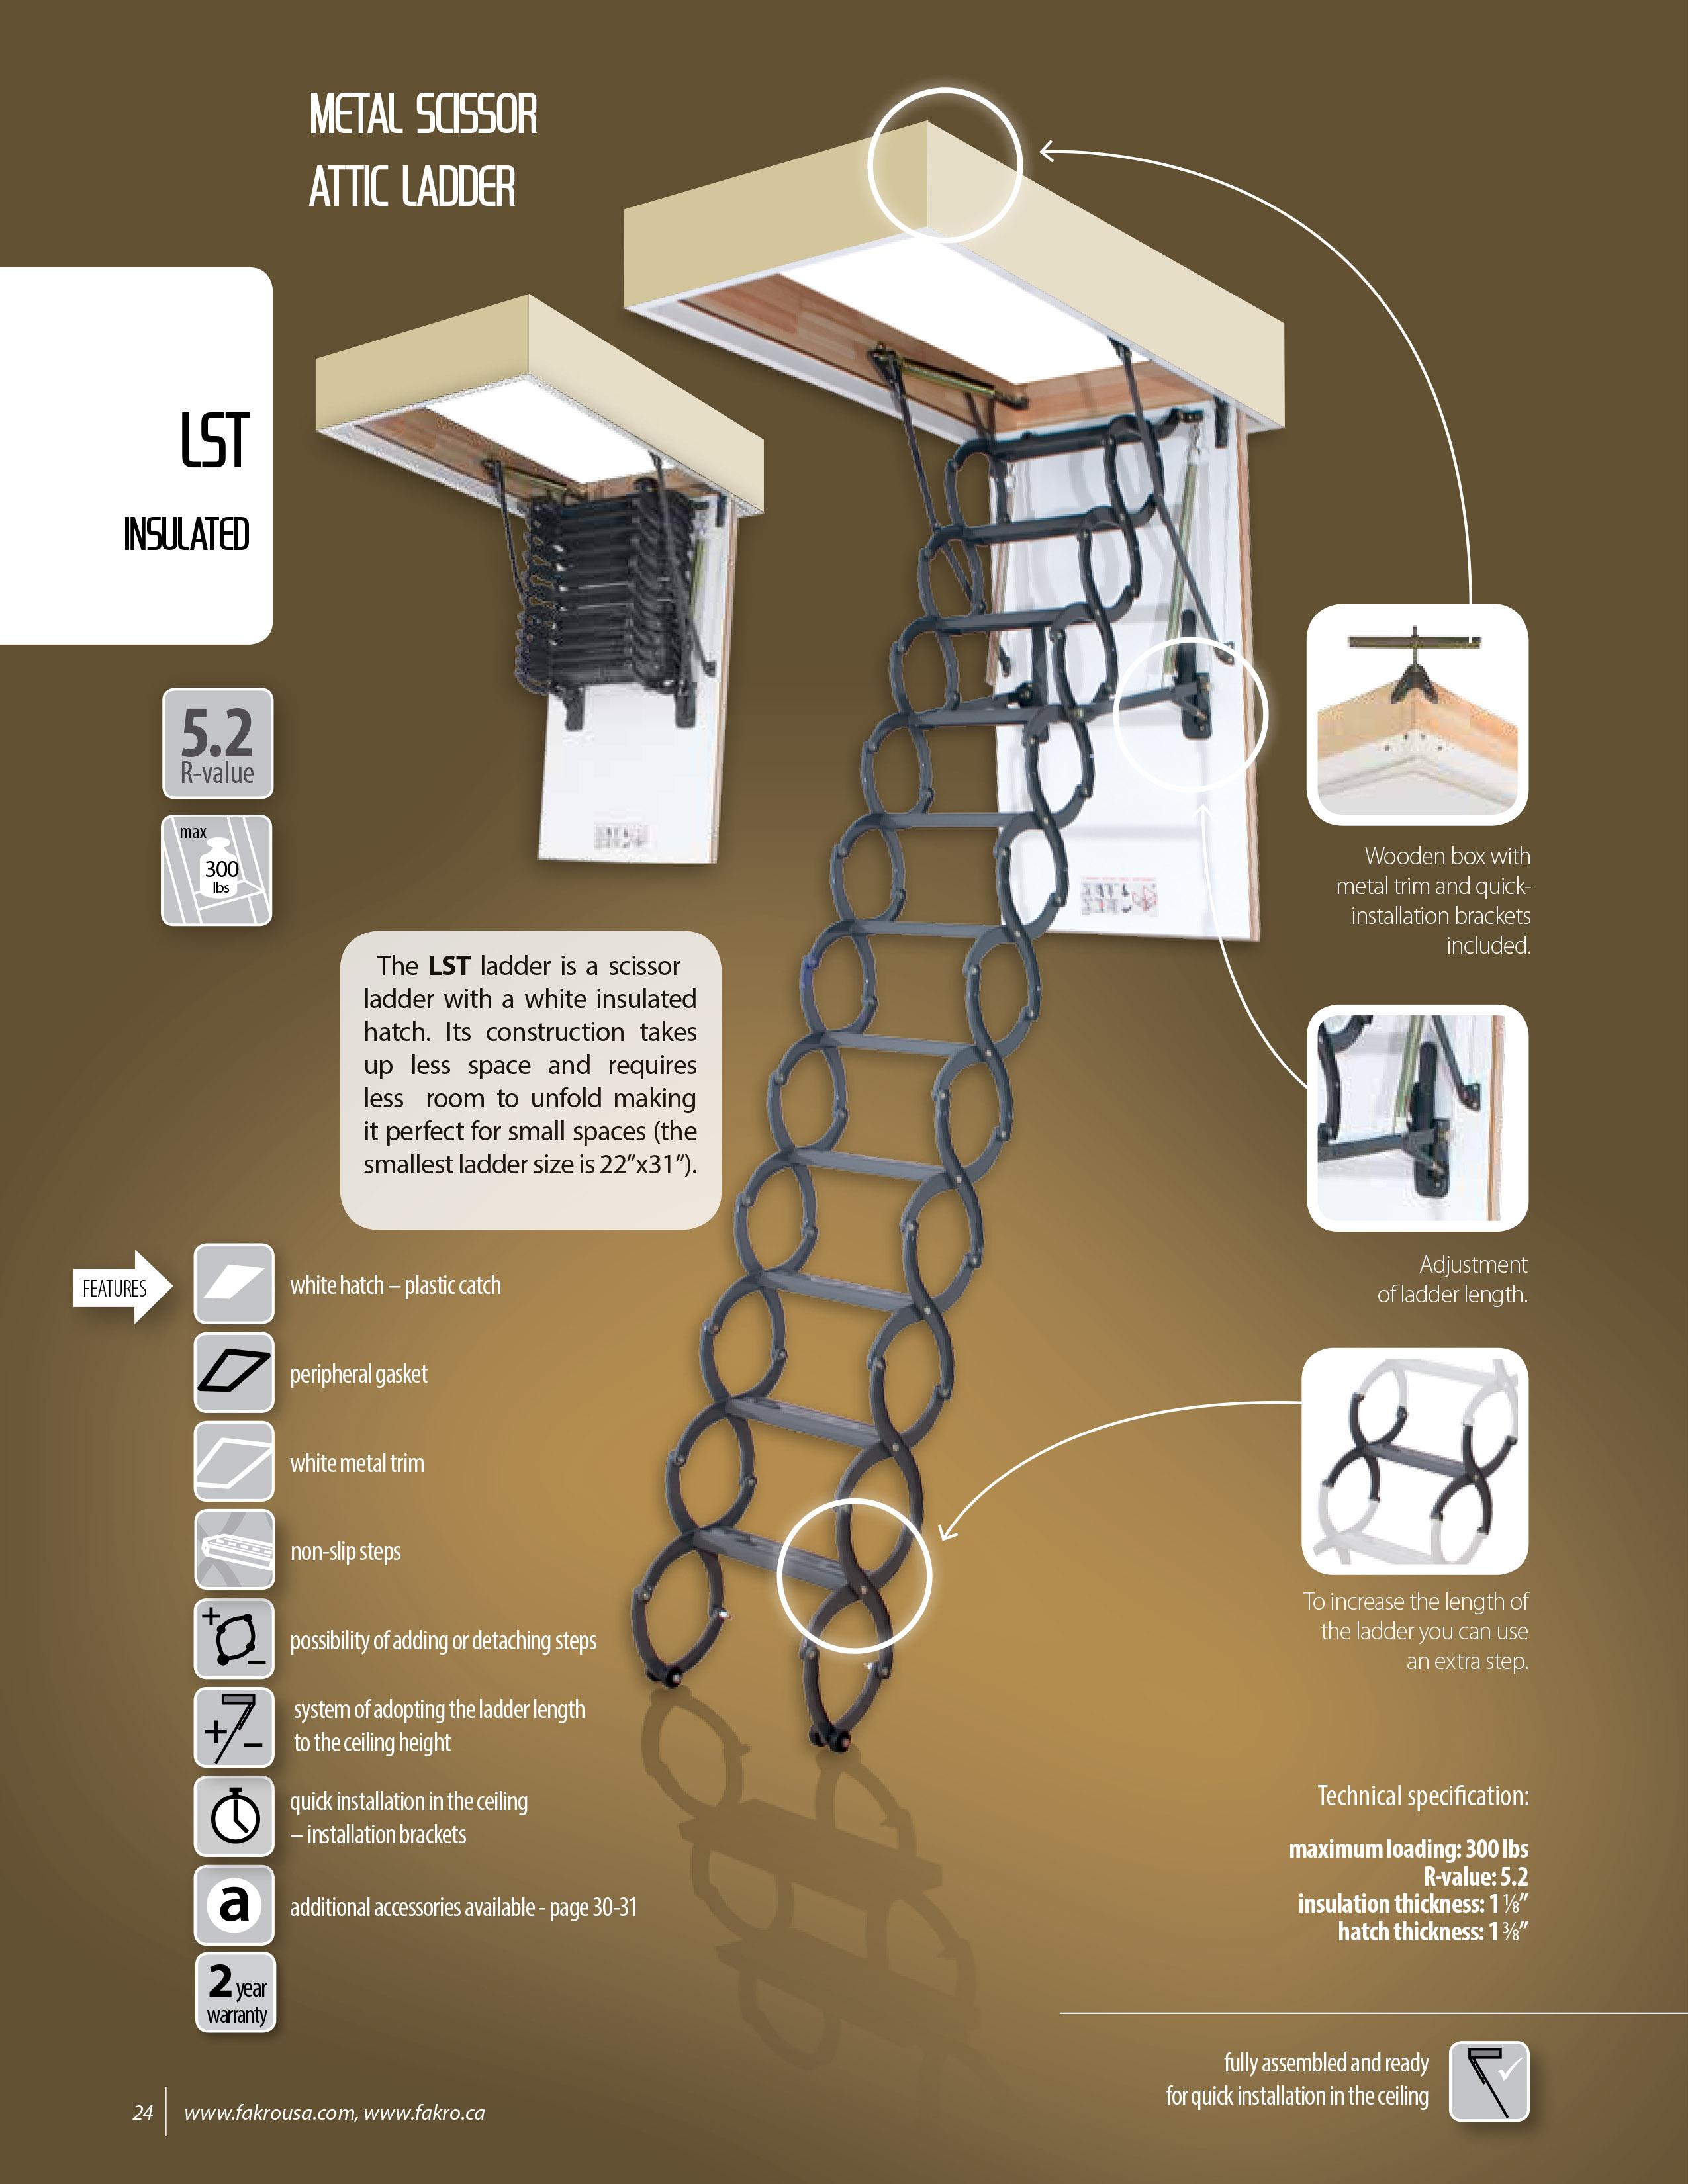 Fakro Lst Quot Insulated Quot Metal Scissor Attic Ladder 300 Lbs